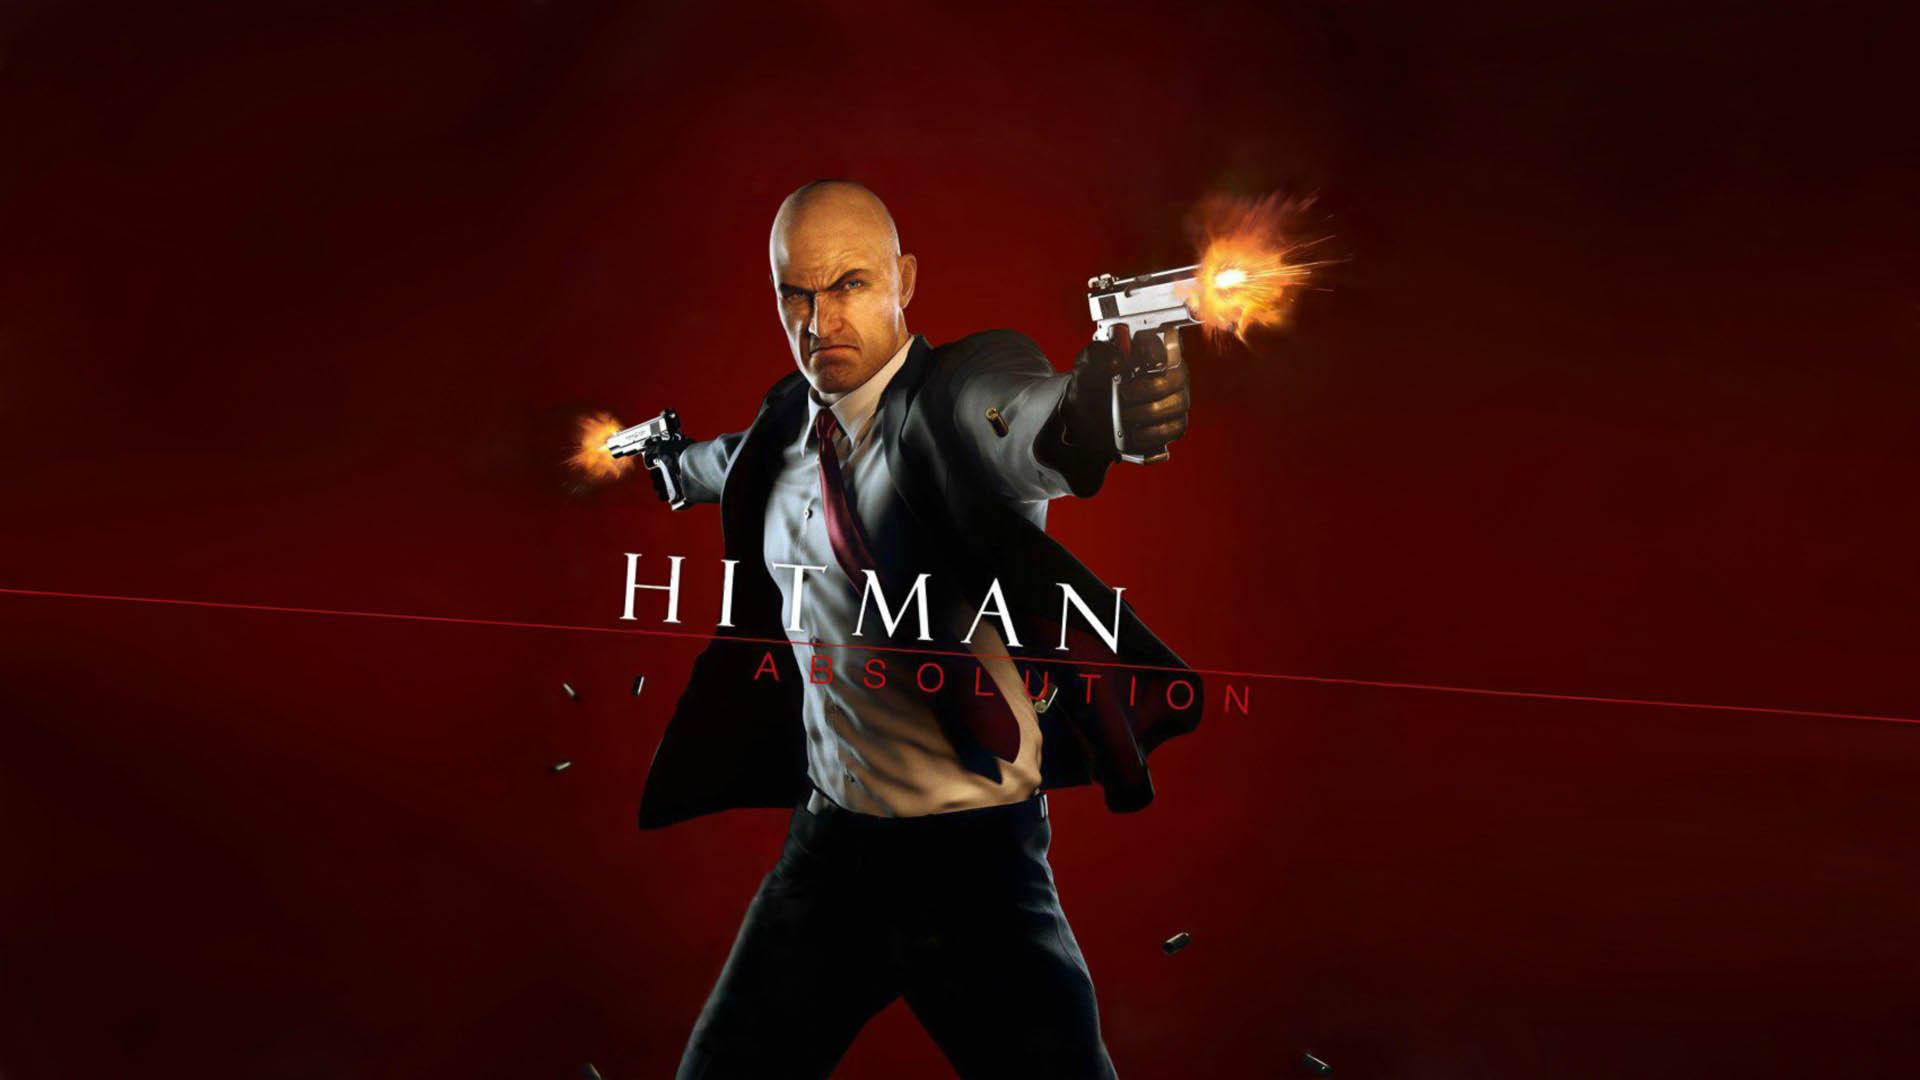 Wallpaper Hitman Absolution Agent 47 Movie 1367854 Hd